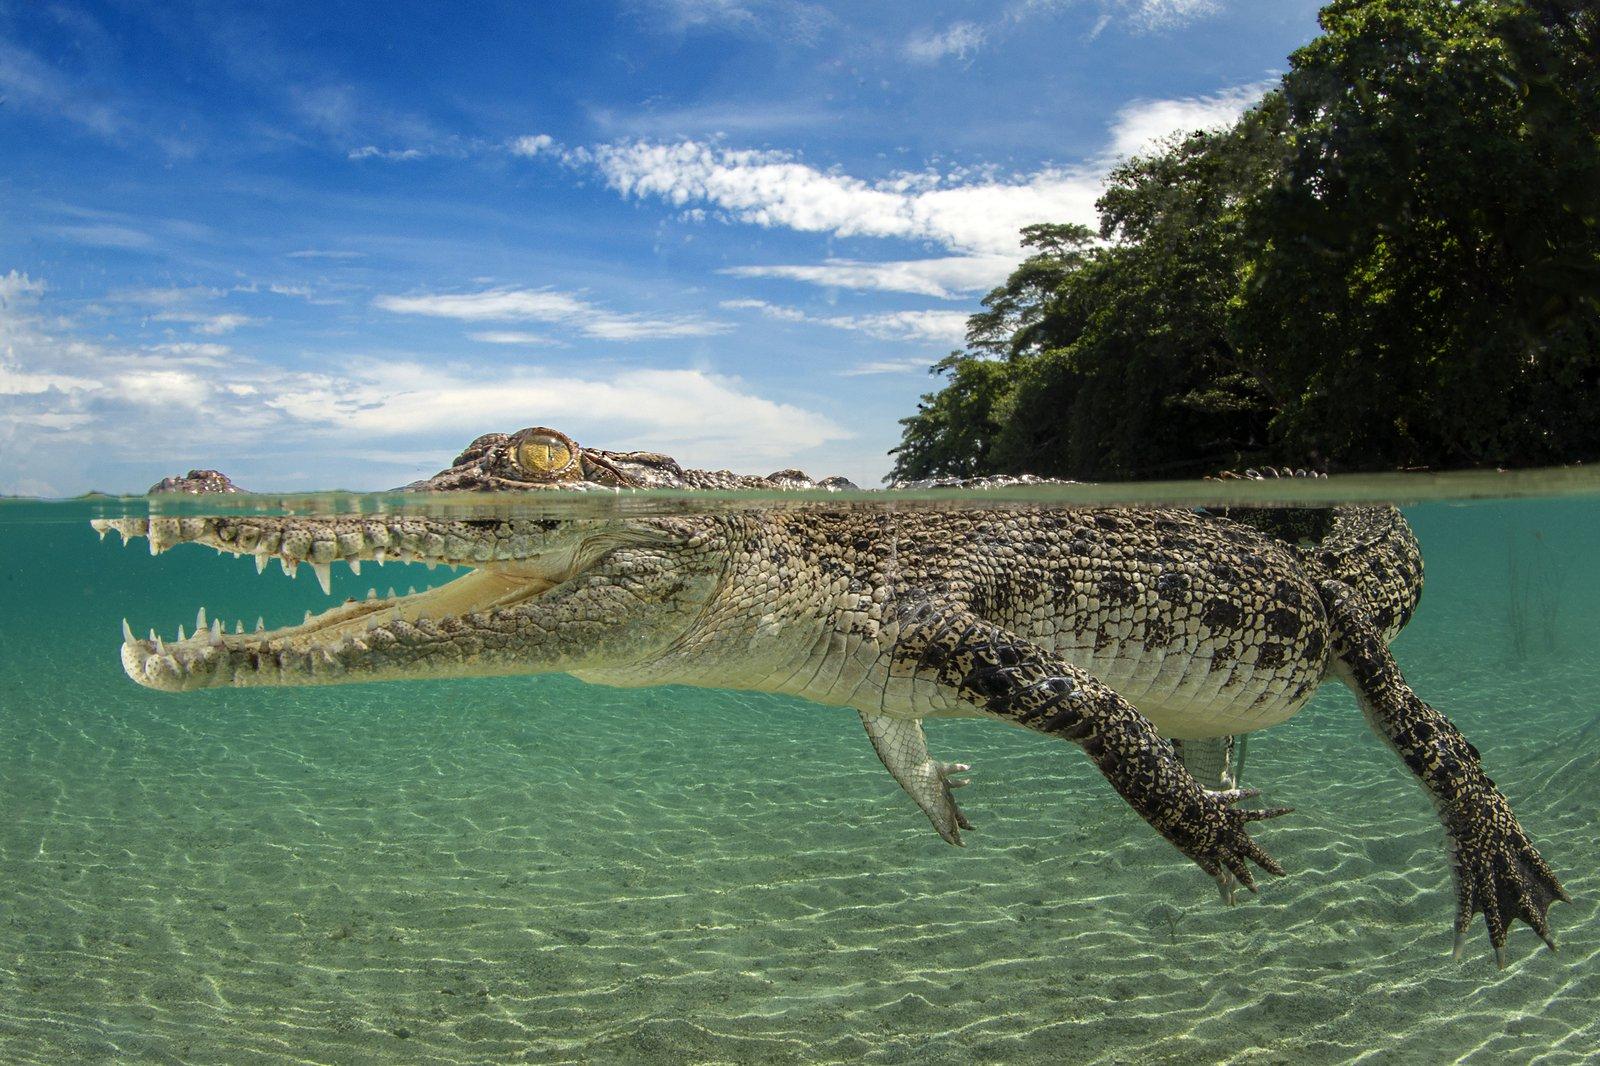 Saltwater Crocodile by Justin Gilligan